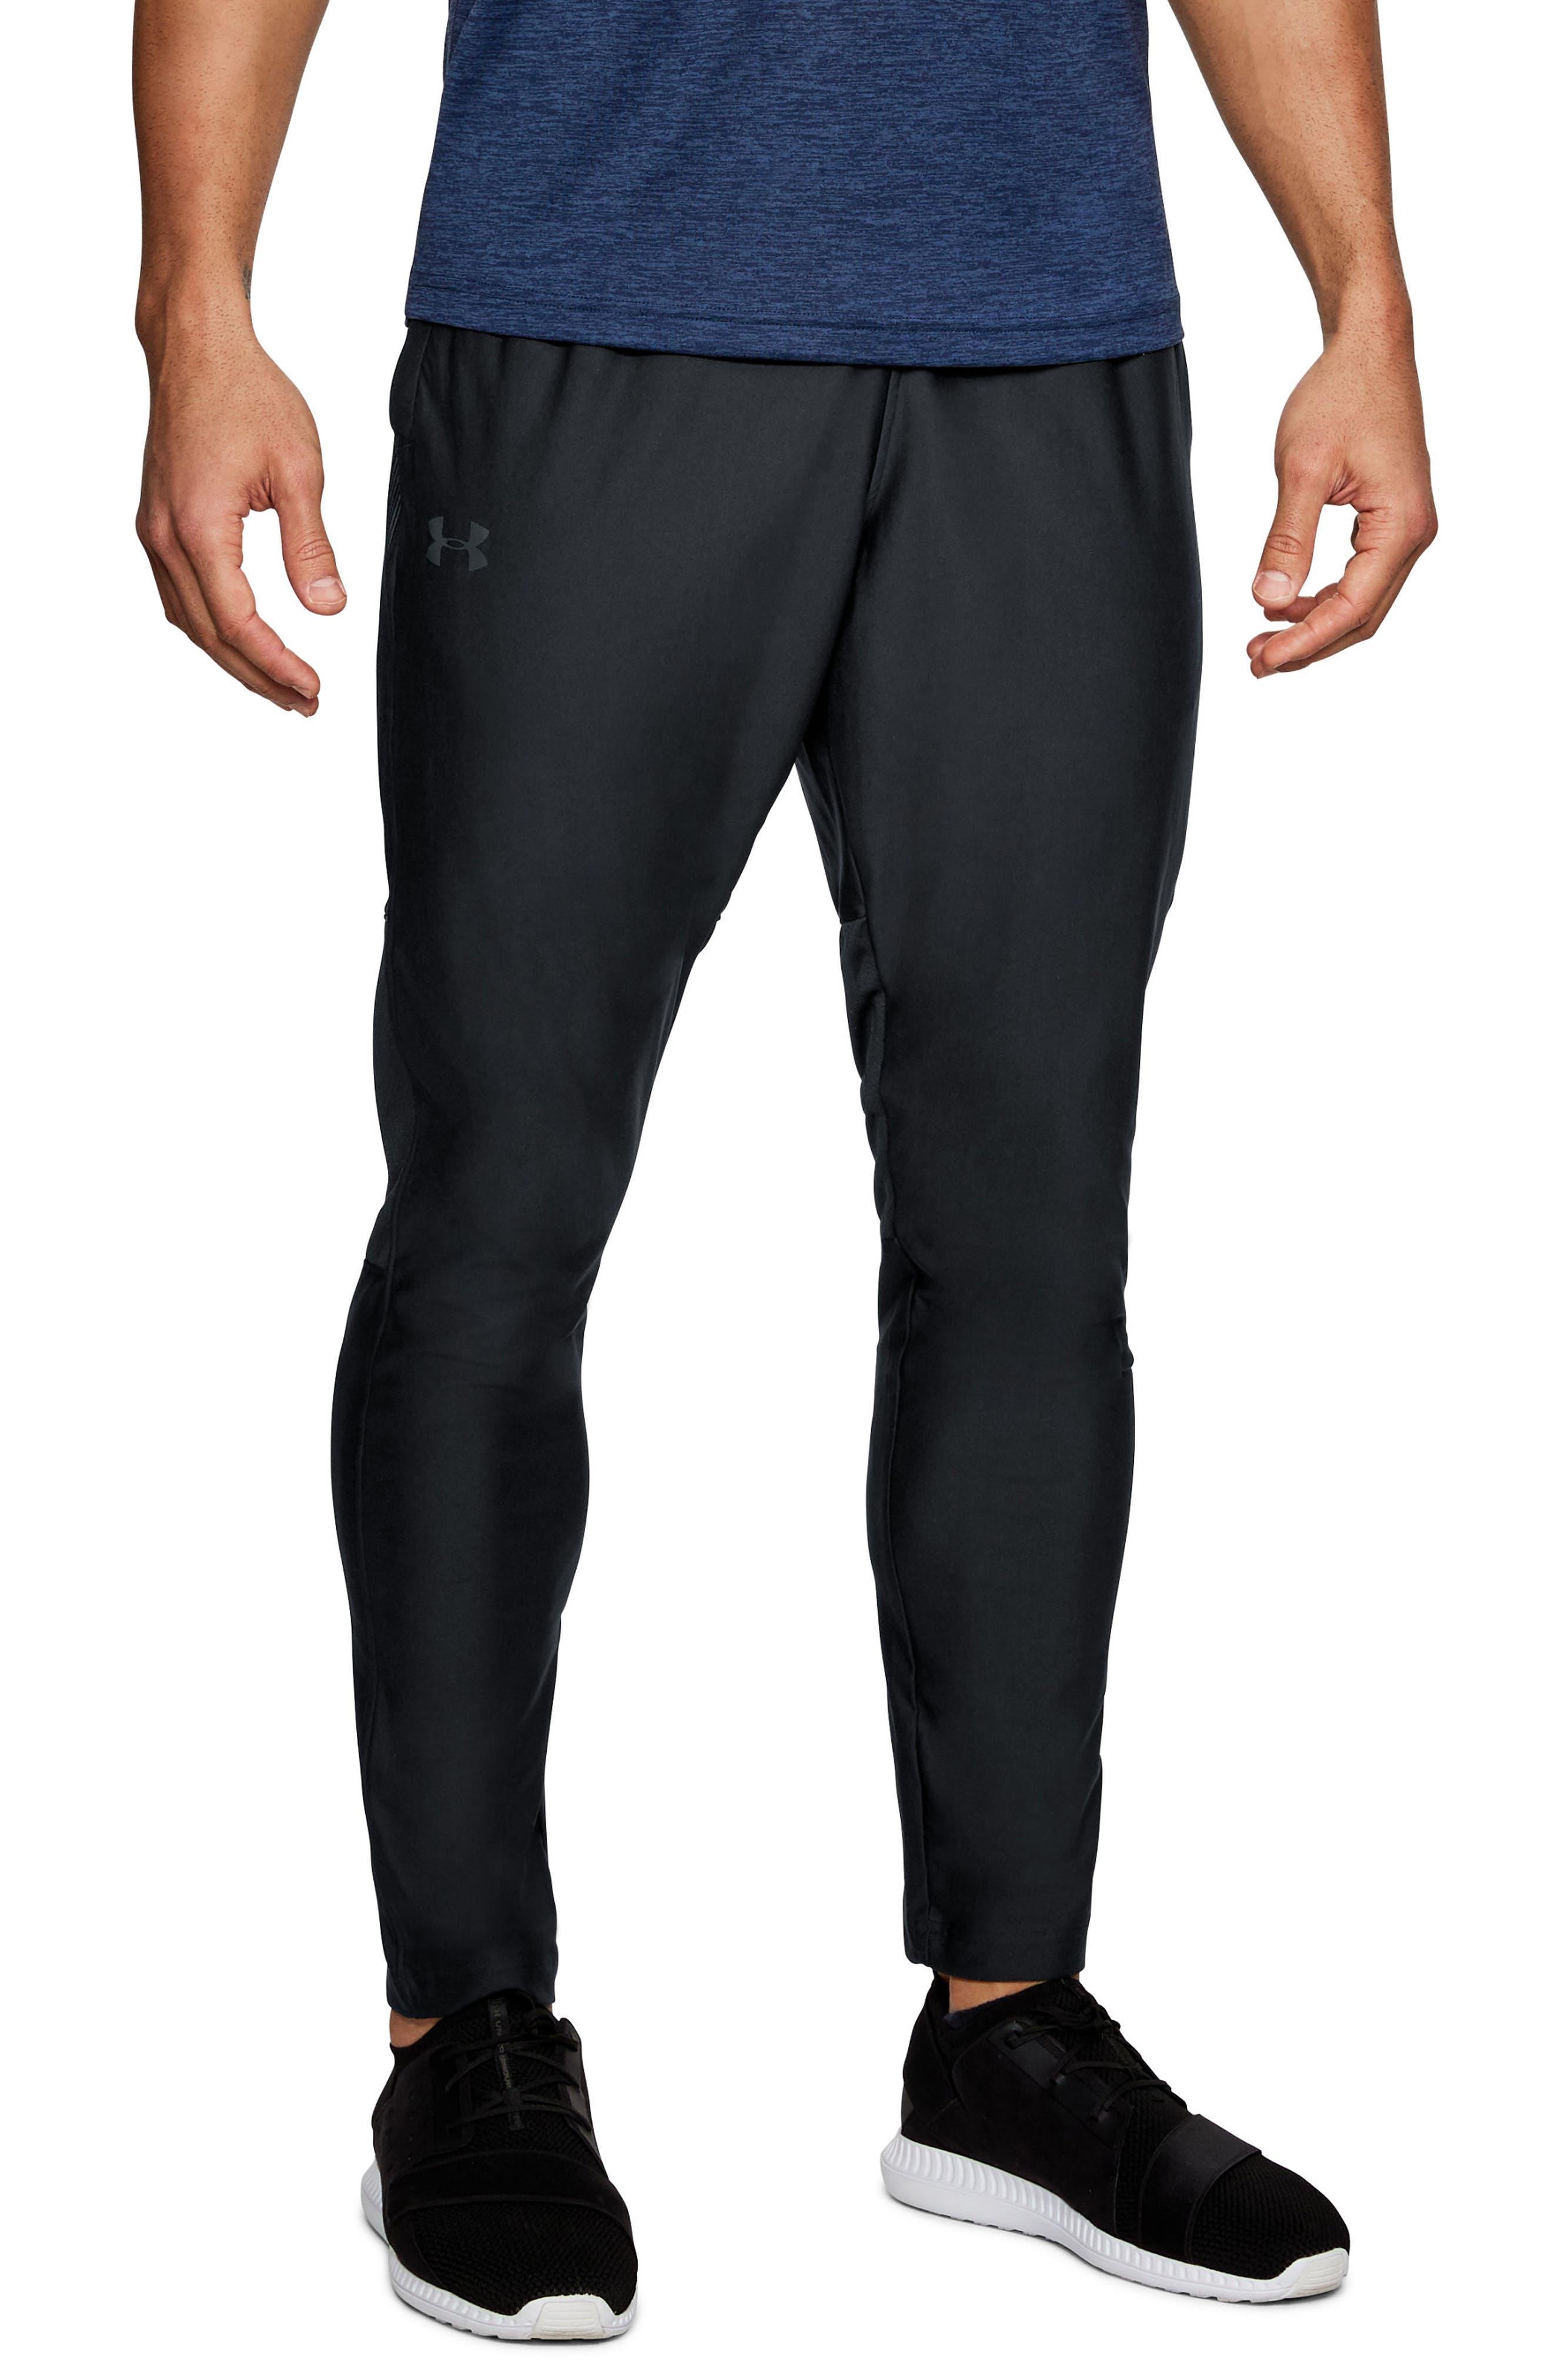 Threadborne Vanish Pants,                             Main thumbnail 1, color,                             Black/ Anthracite